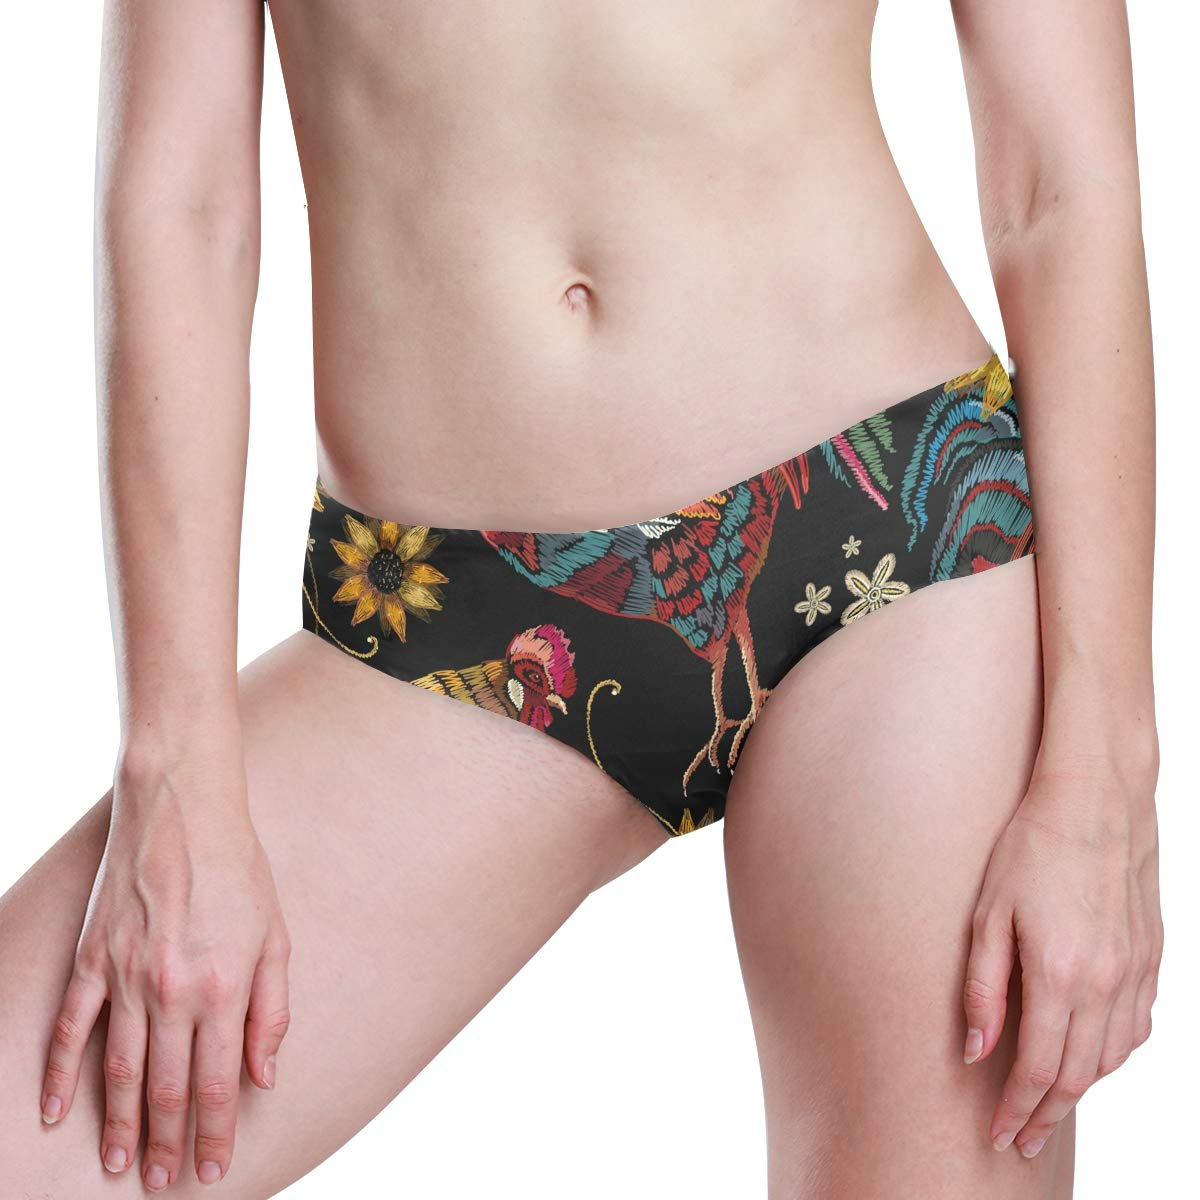 KGuanJi Seamless Rooster Chicken Sunflower Bikini Underwear Low Rise-2 Pack